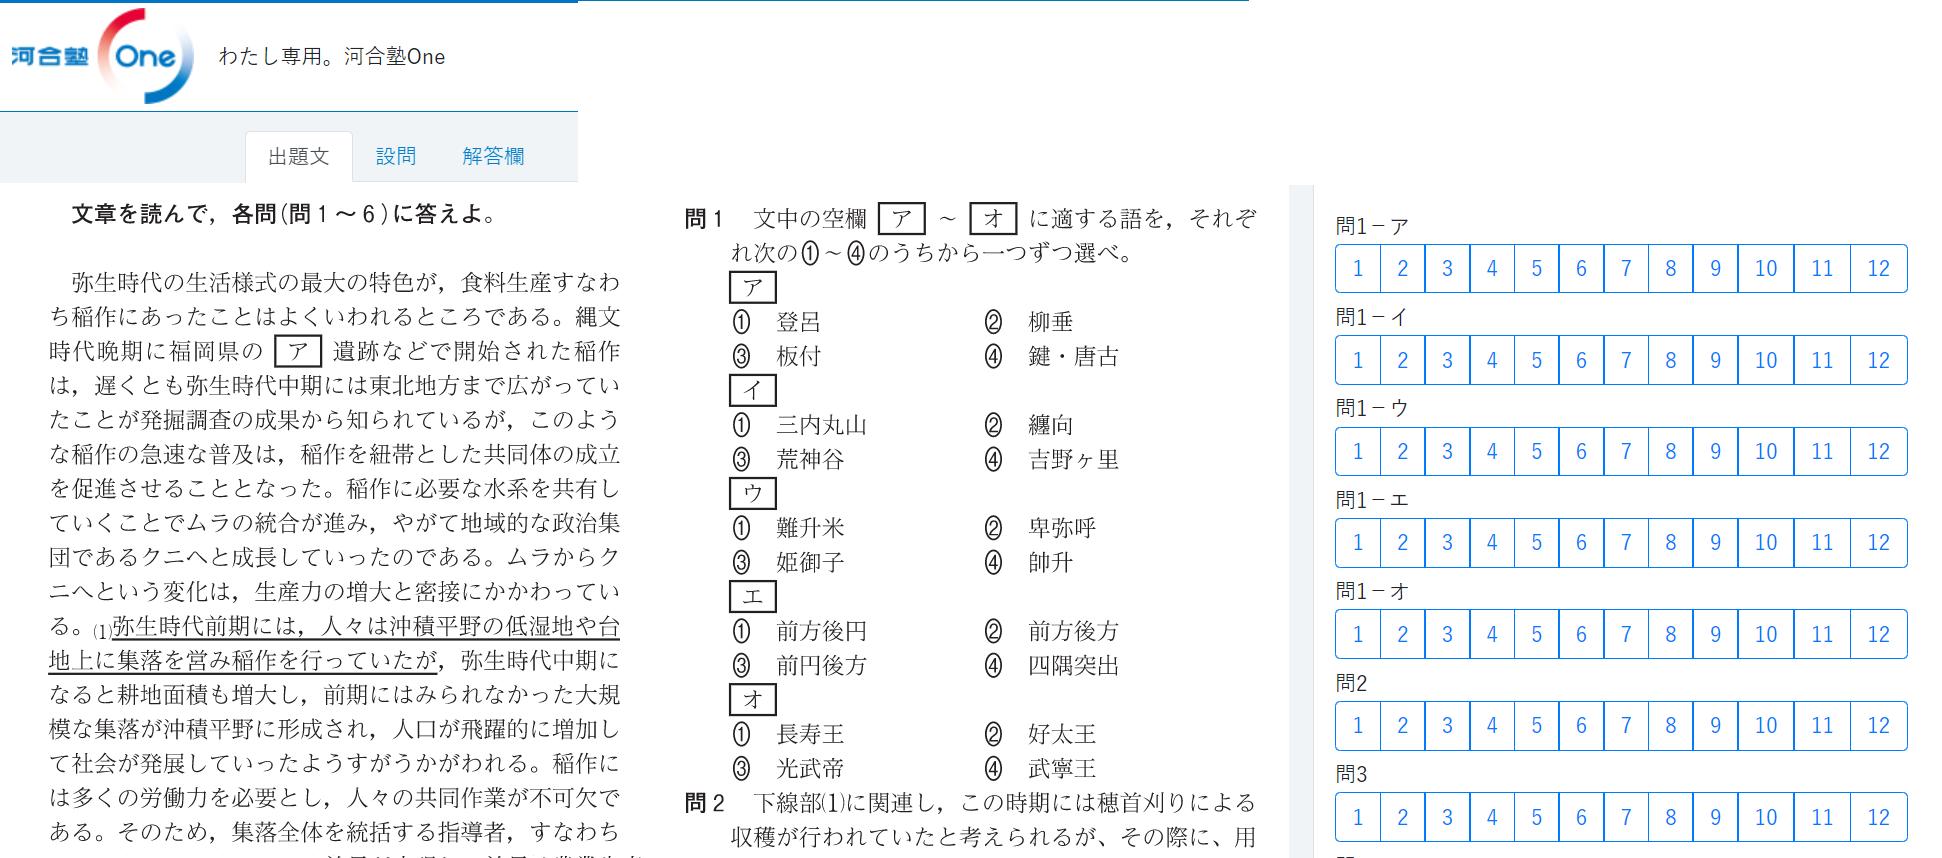 河合塾Oneの練習問題画面